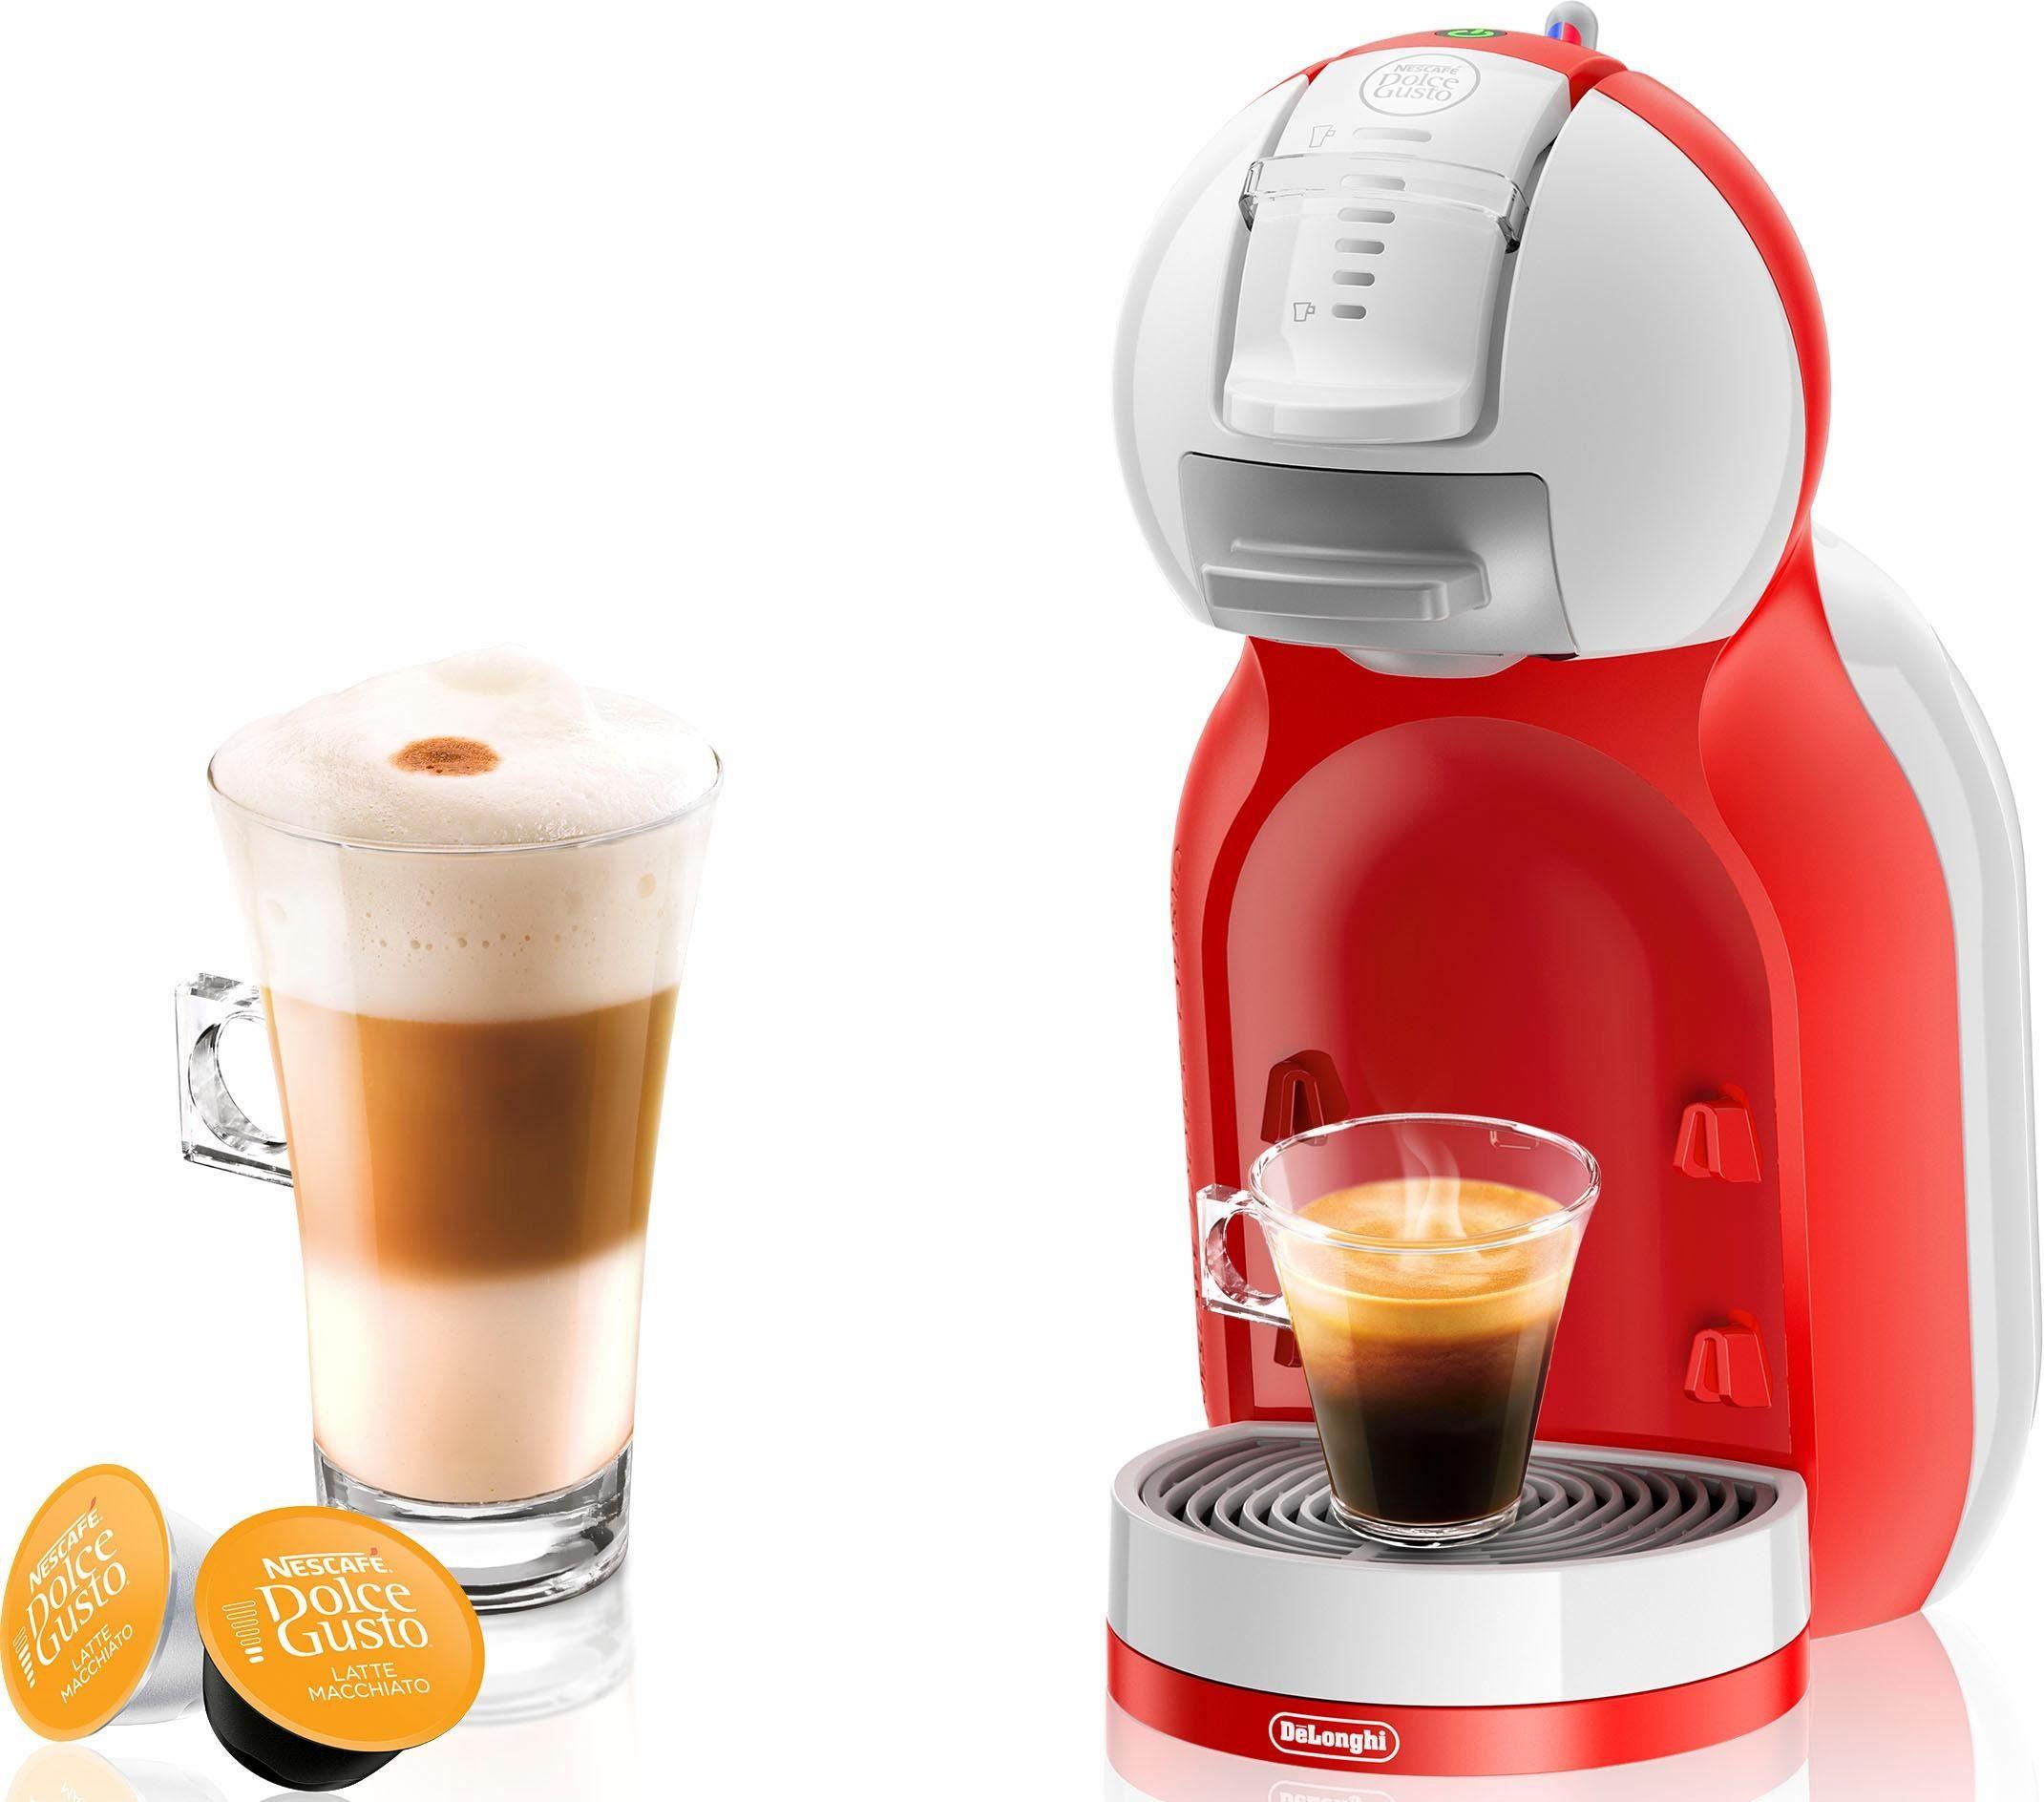 Nescafé Dolce Gusto Kapselmaschine NESCAFÉ® Dolce Gusto® MINI ME DG305.WR, inkl. 10,- Gutschein